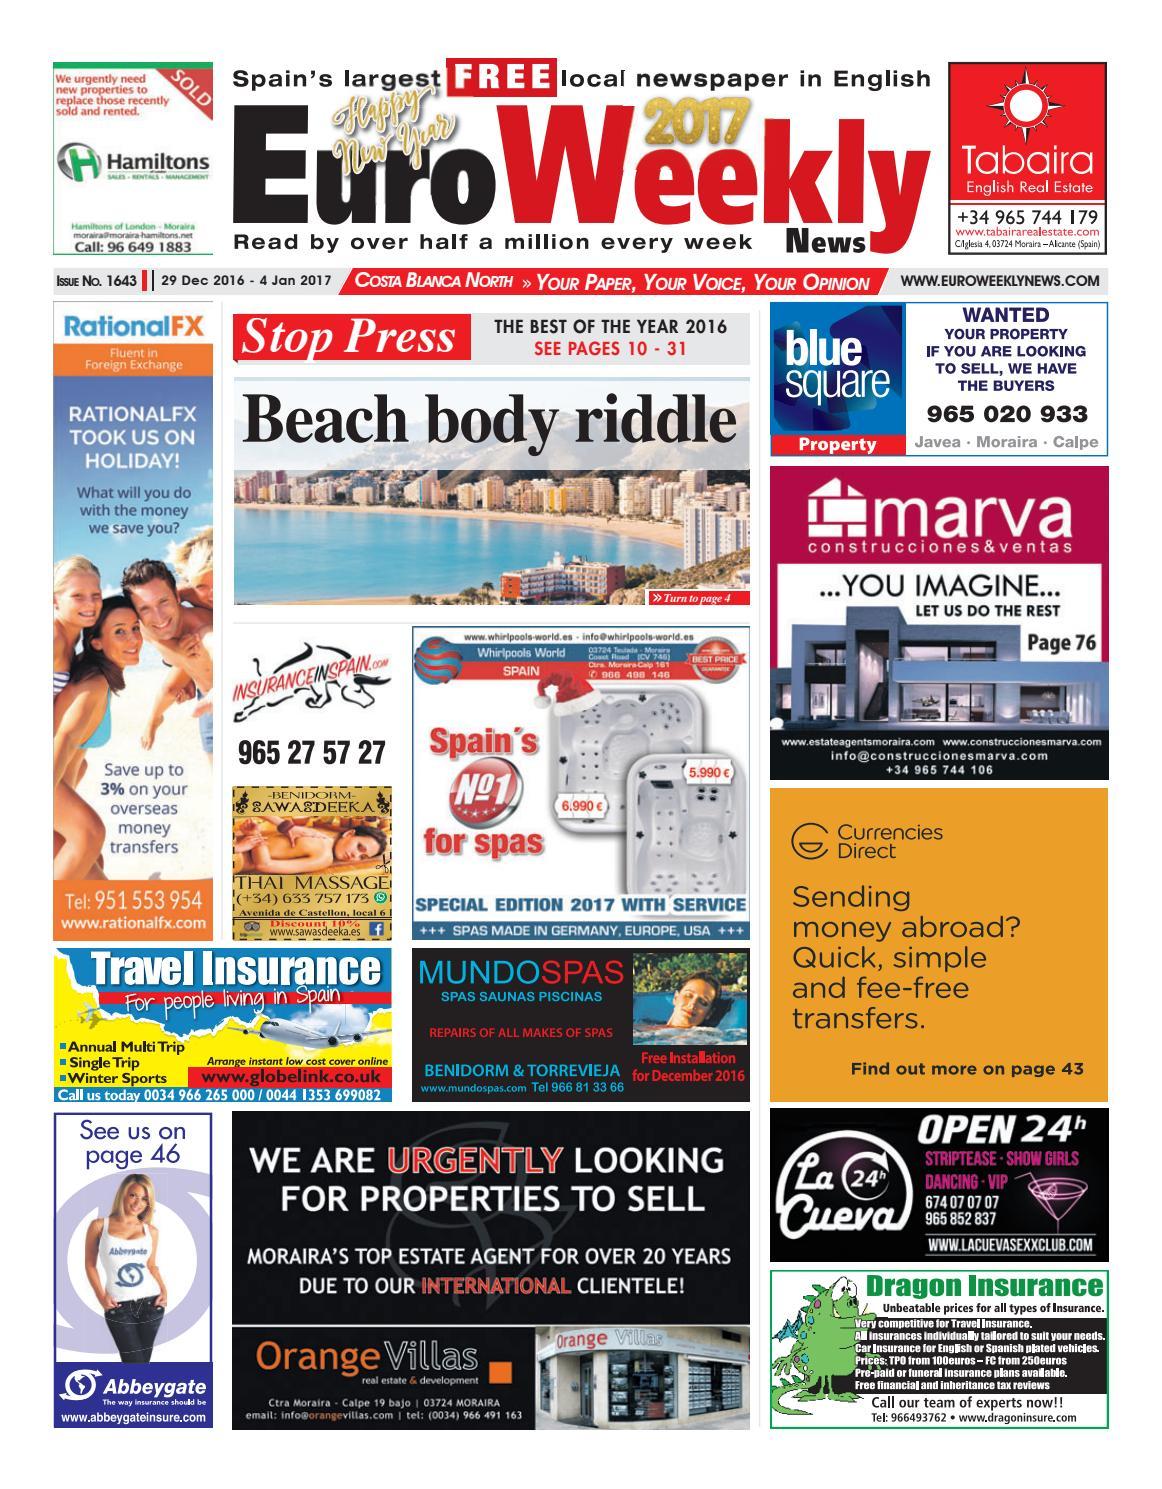 Euro Weekly News - Costa Blanca North 29 December 2016 - 4 ...